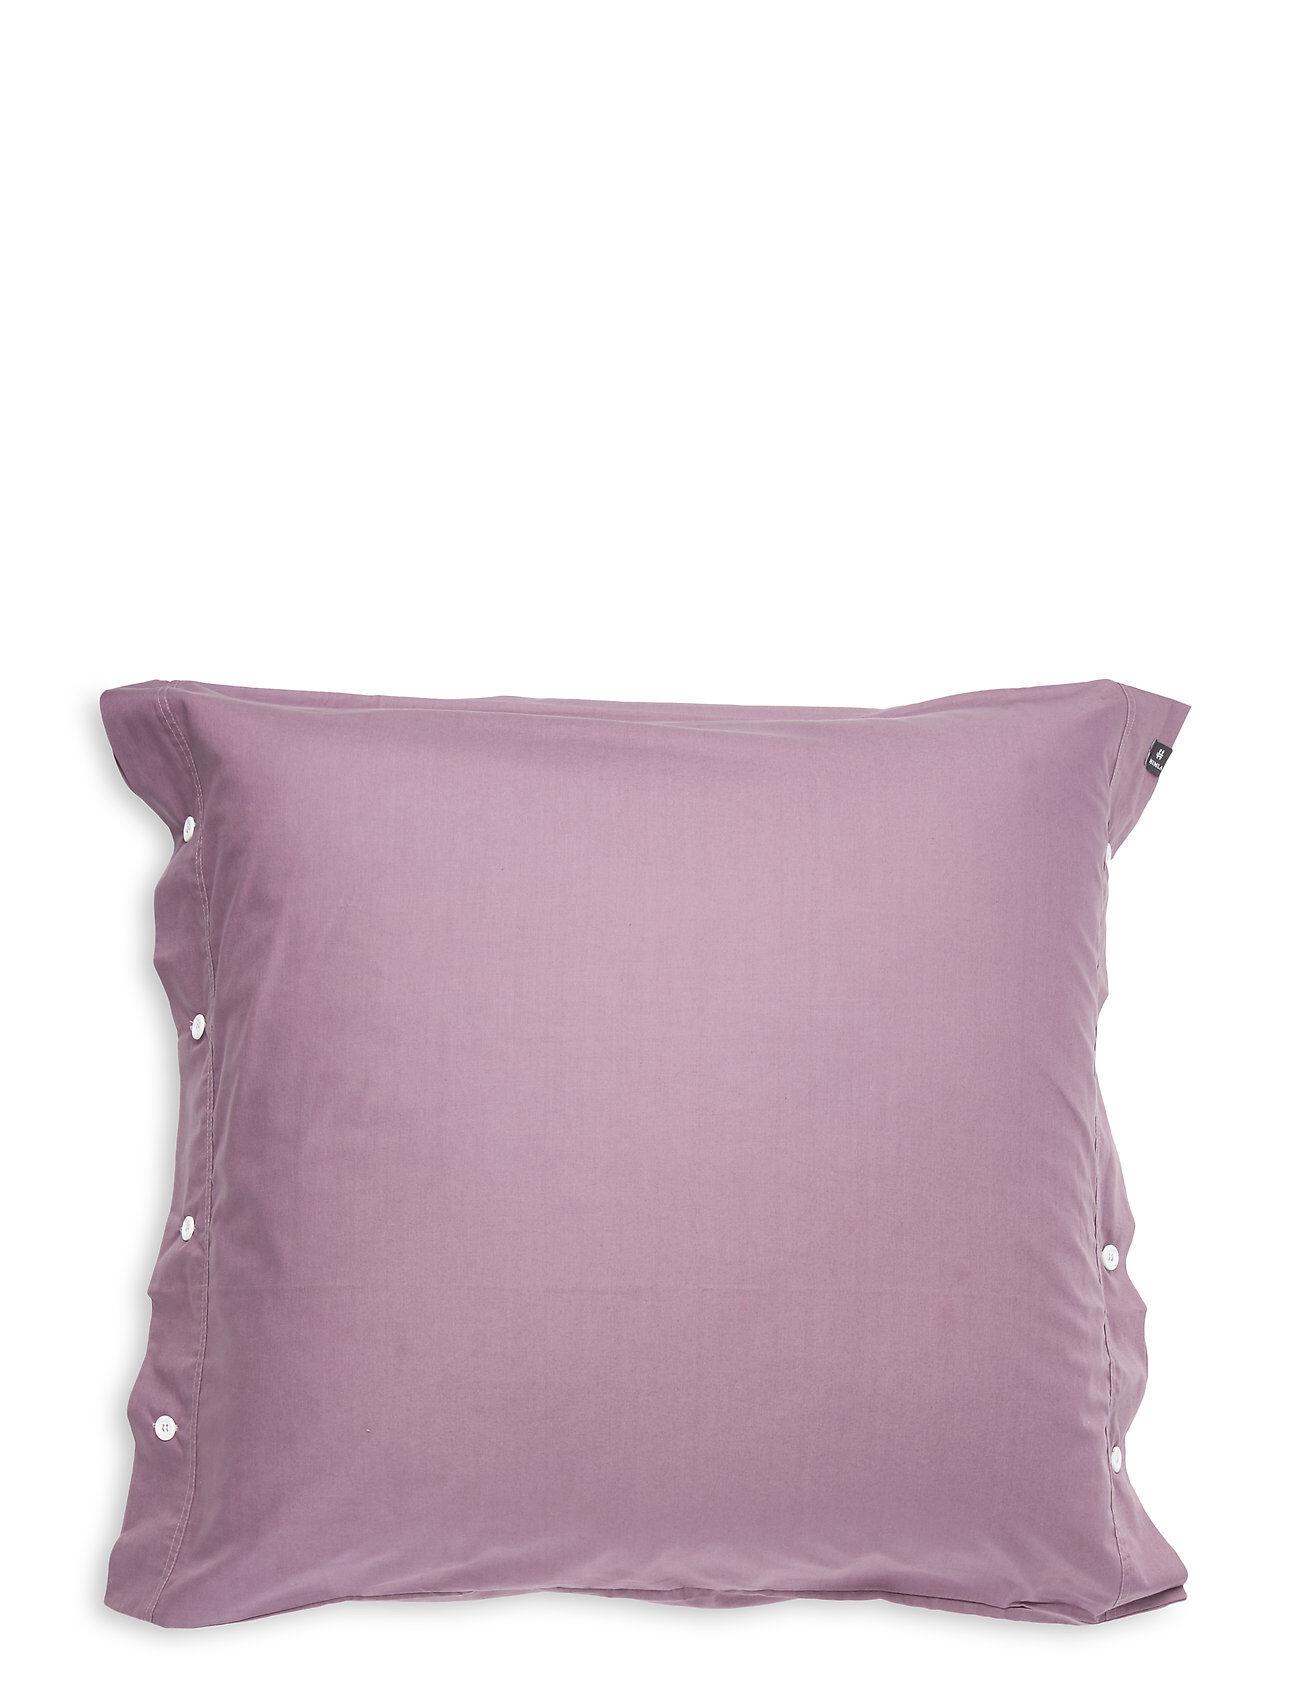 Himla Drottningholm Pillowcase With Wing Home Bedroom Bedding Pillowcases Liila Himla